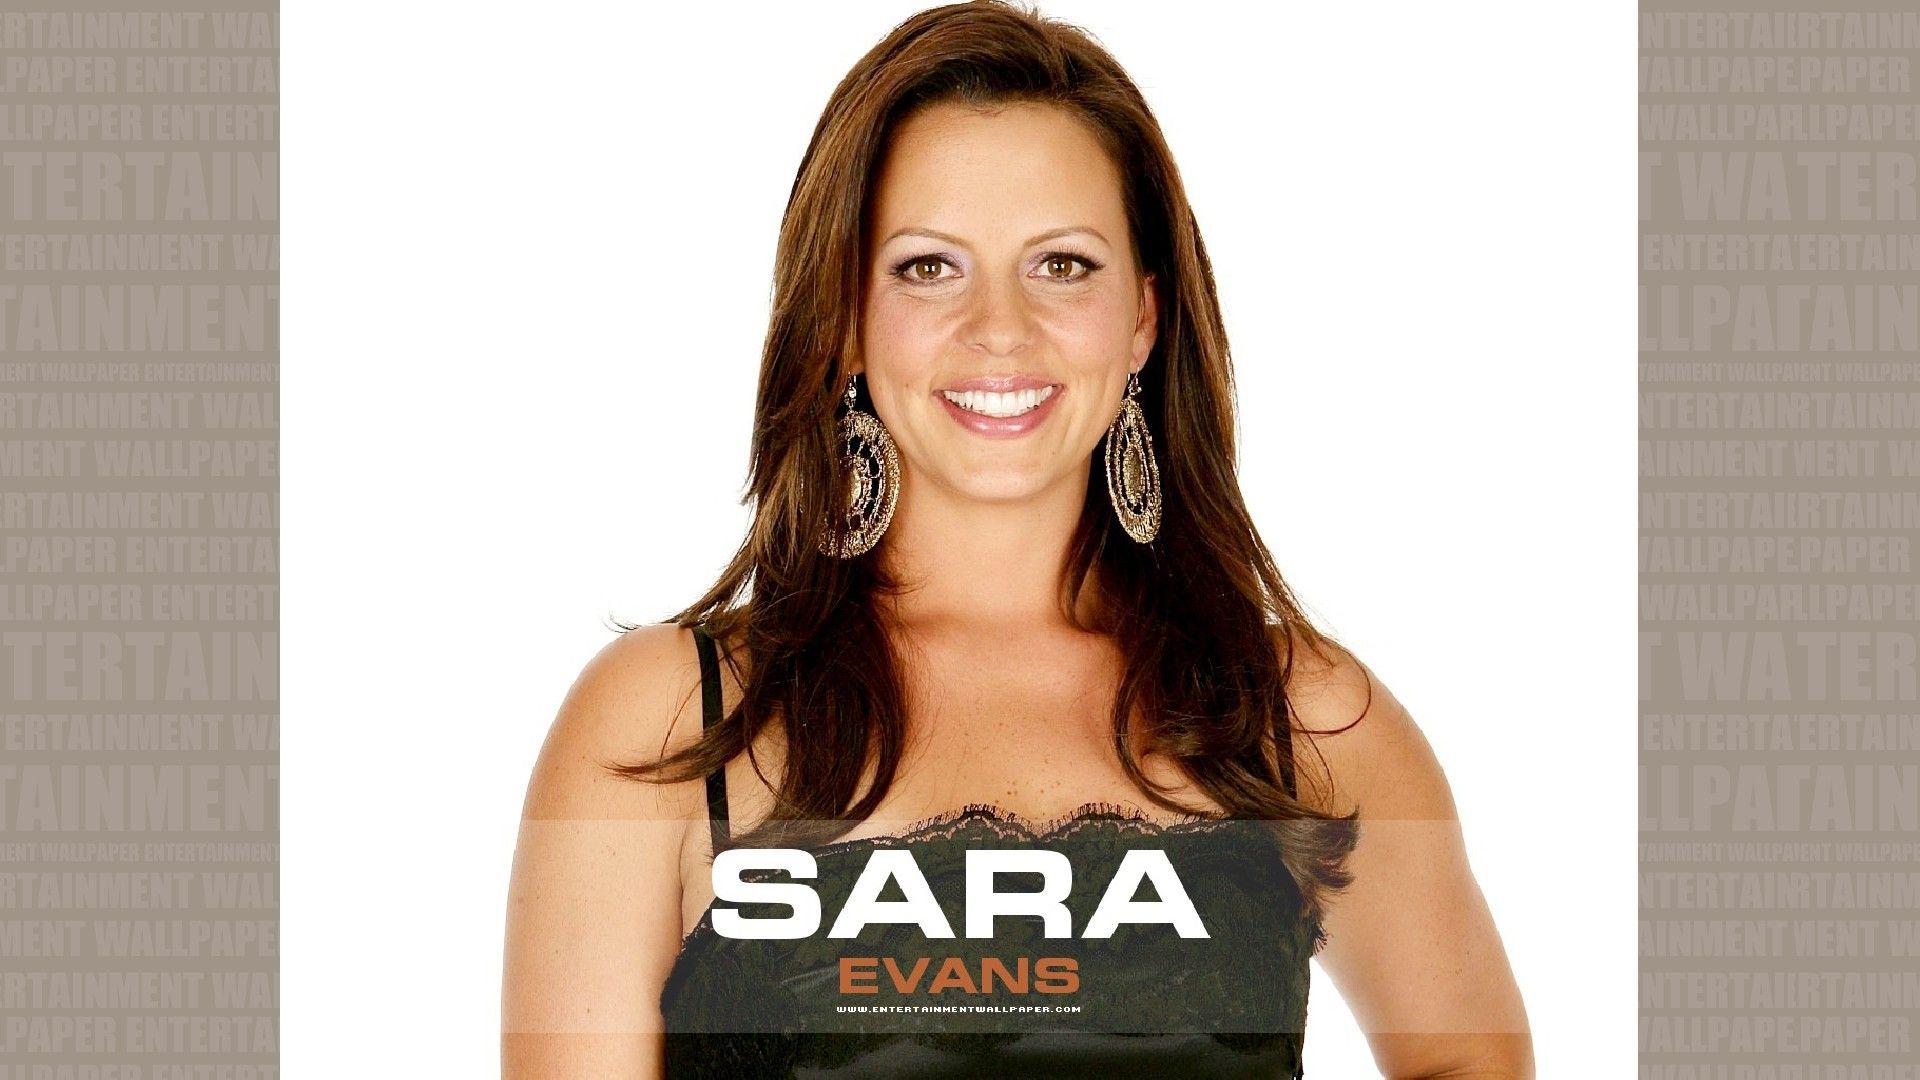 Sara Evans Wallpaper Original size, download now. Sara